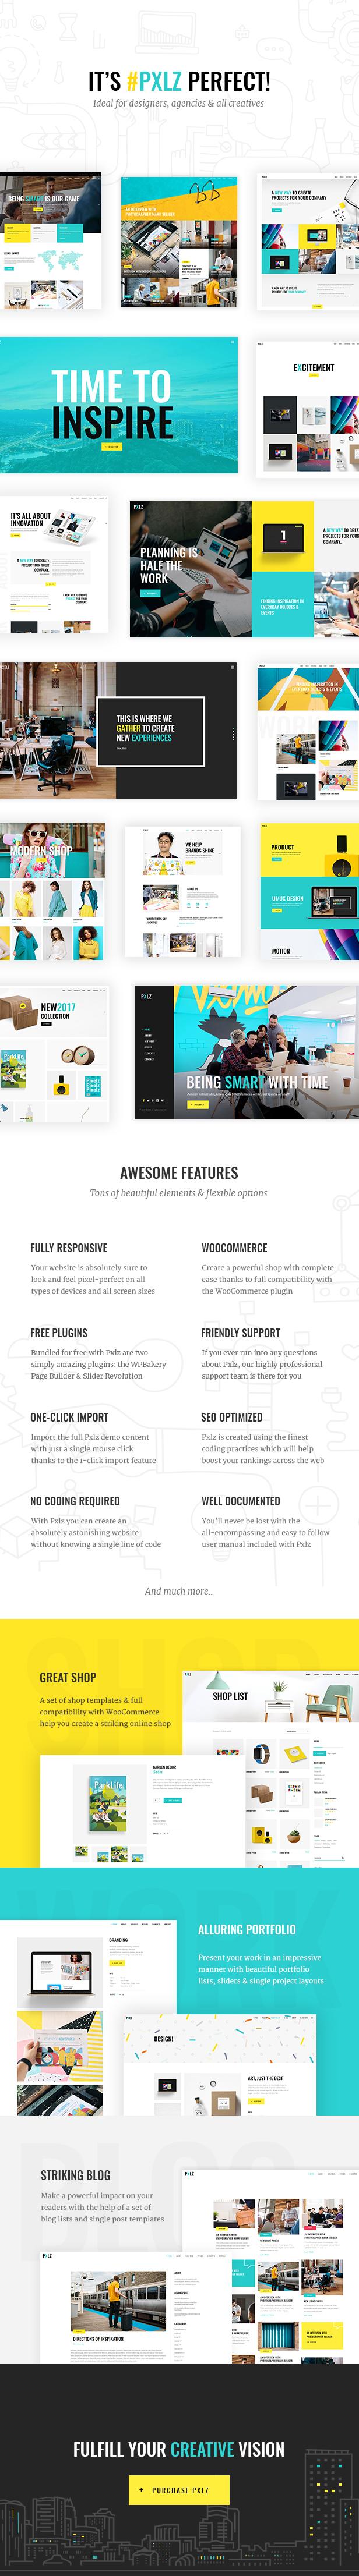 Pxlz - Creative Design Agency Theme - 1